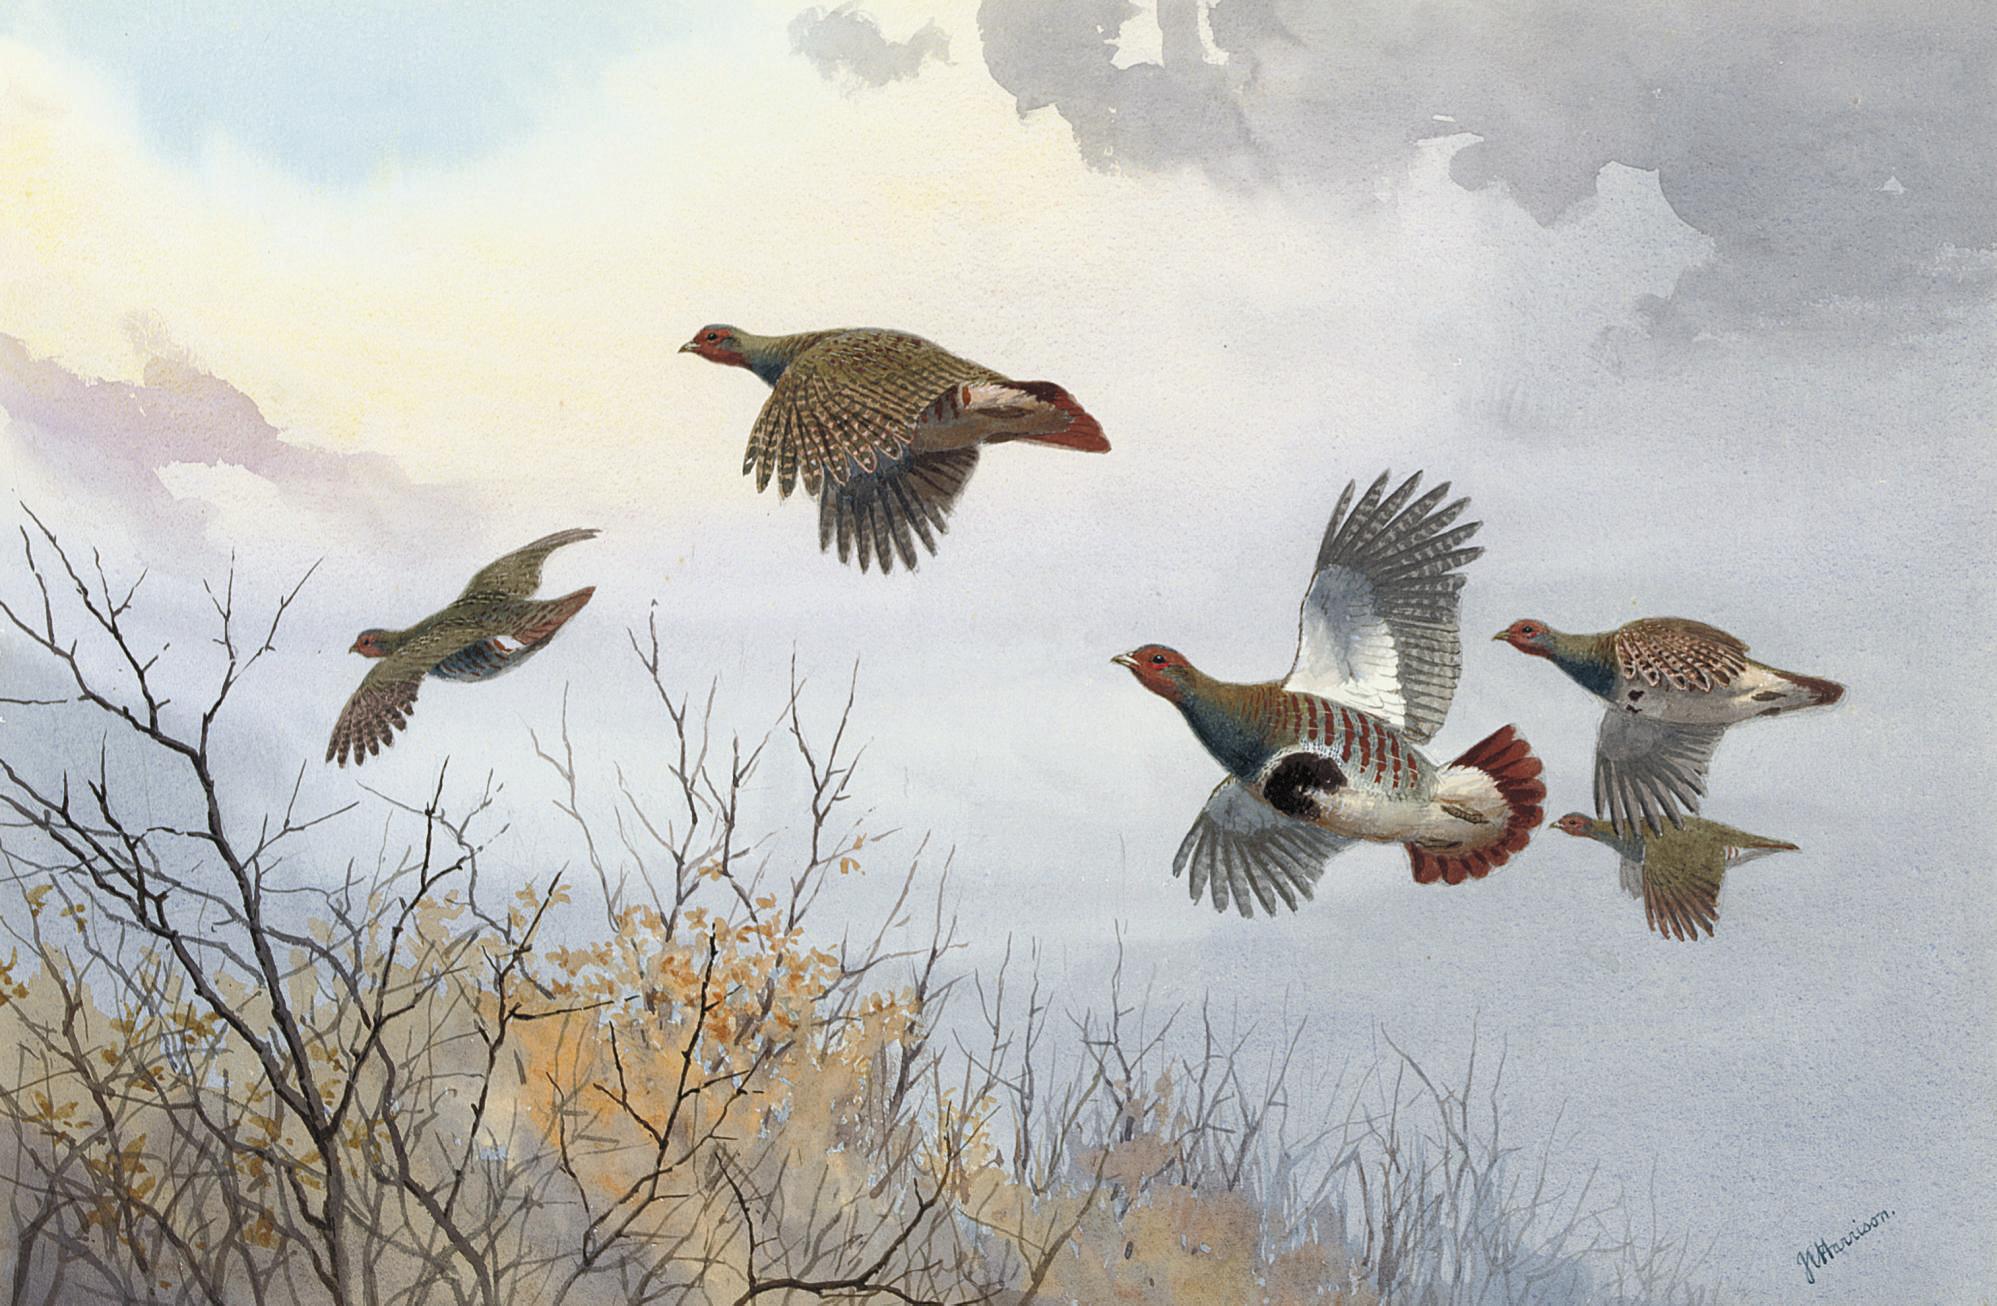 Partridge in flight over trees, Autumn